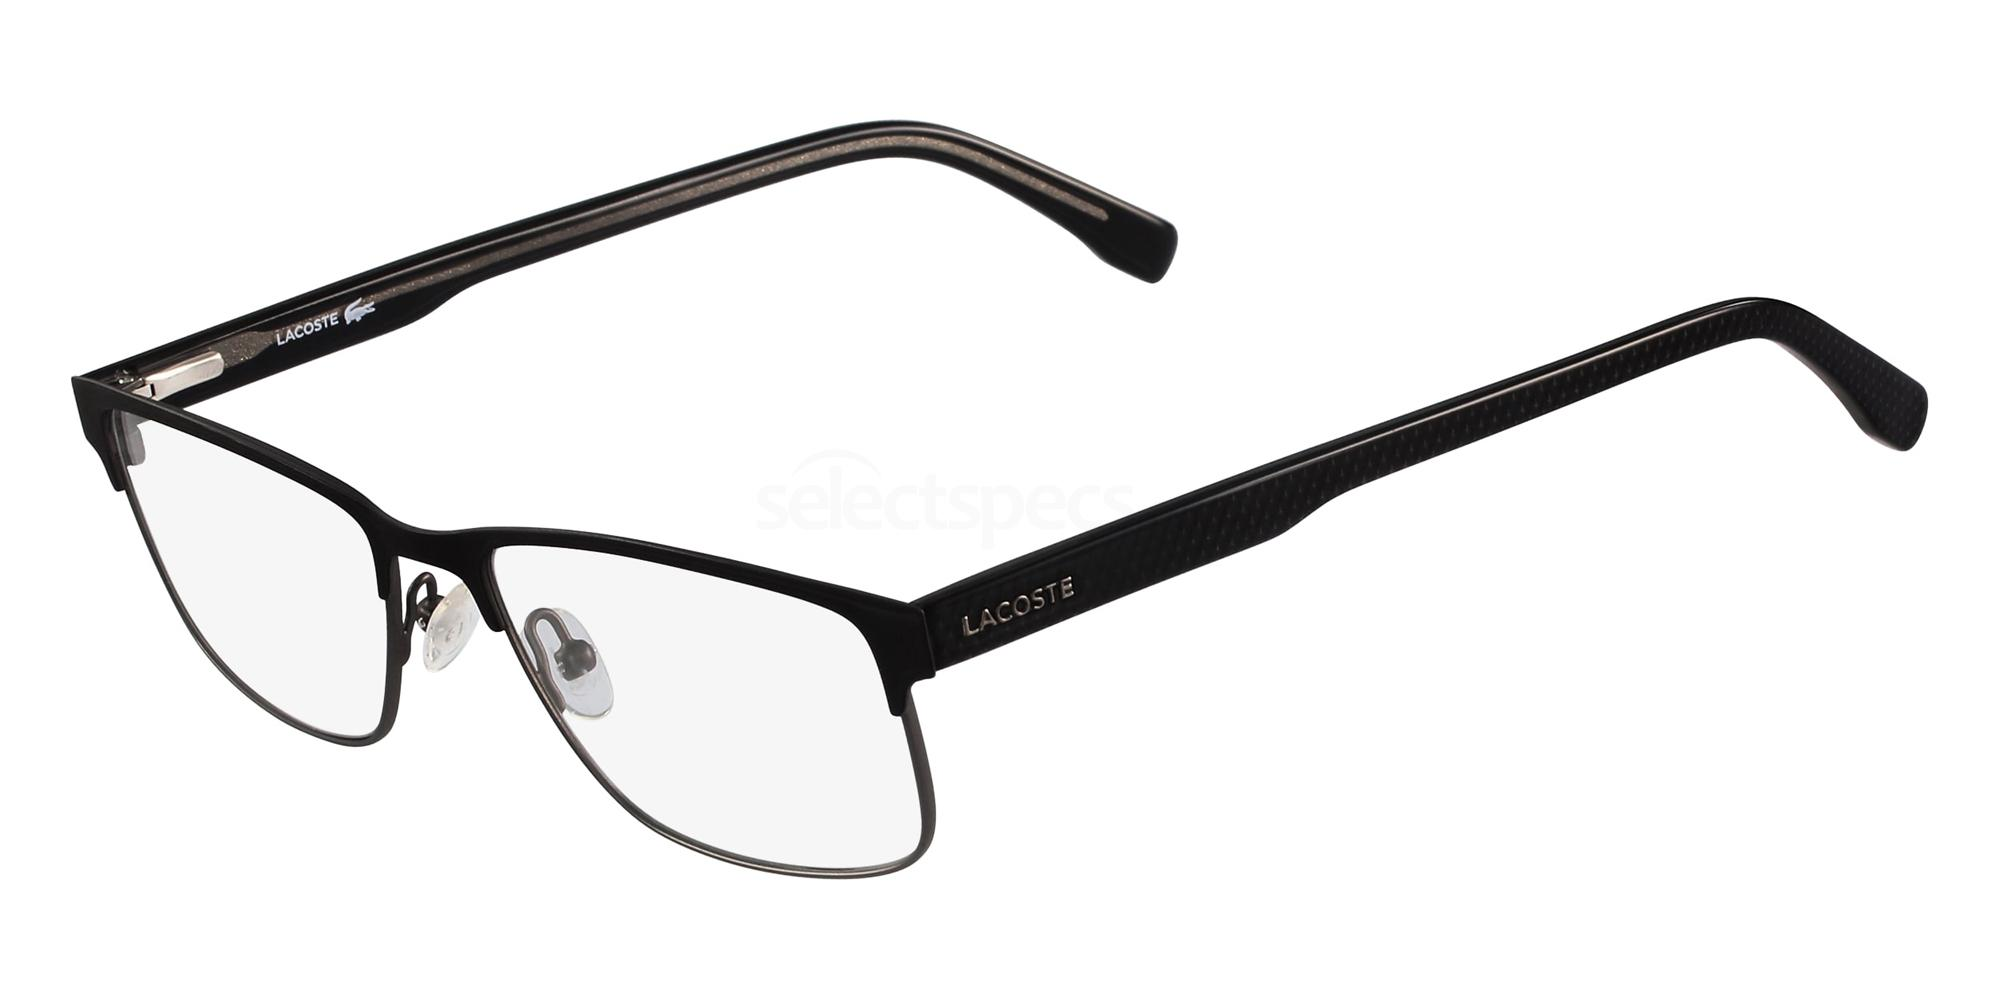 001 L2217 Glasses, Lacoste